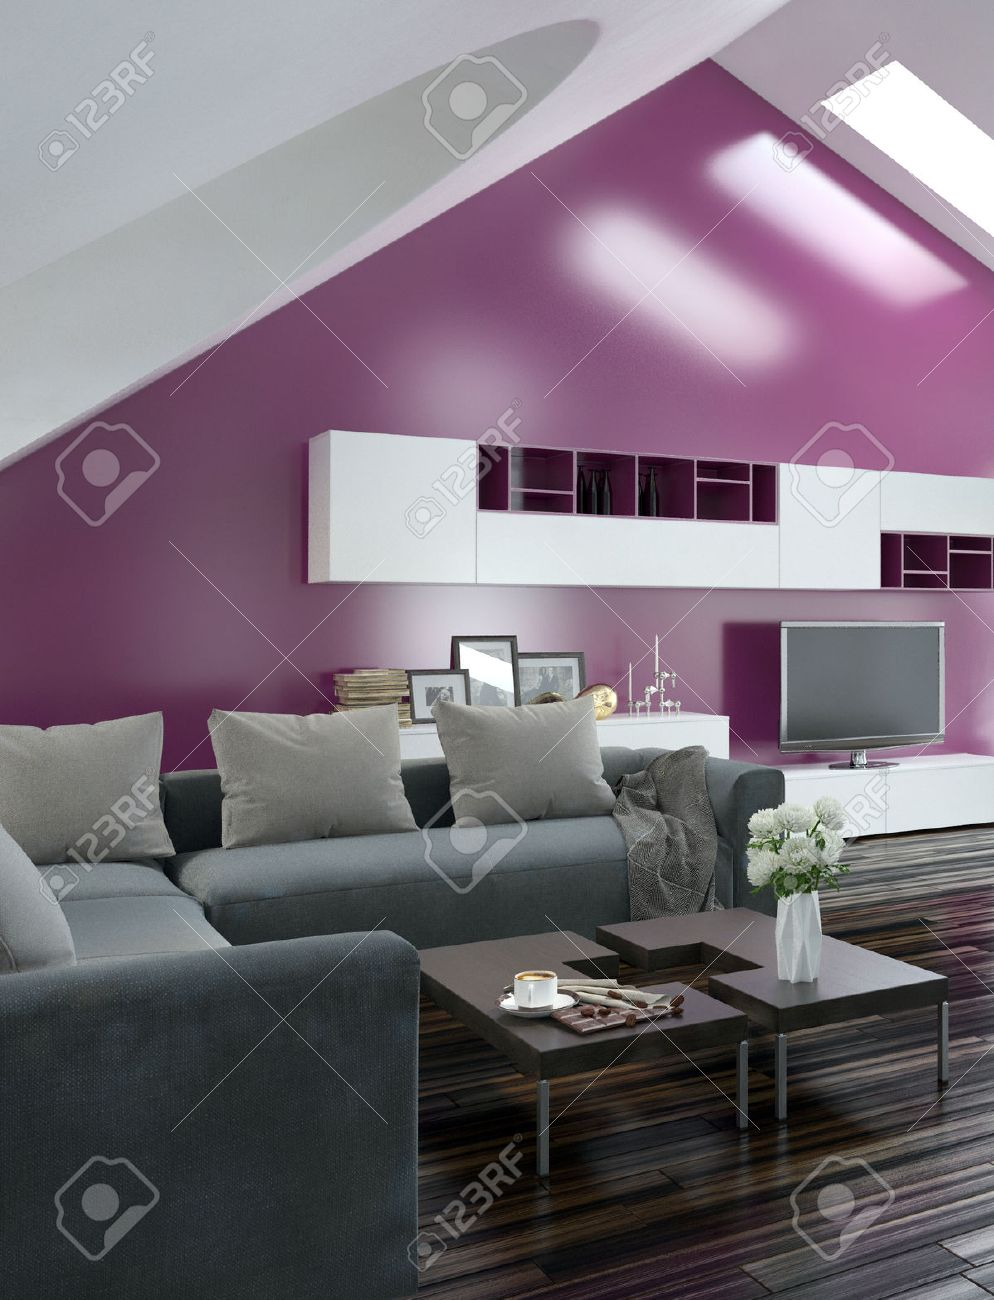 Interior Design Purple Living Room Modern Apartment Living Room Interior With A Purple Accent Wall